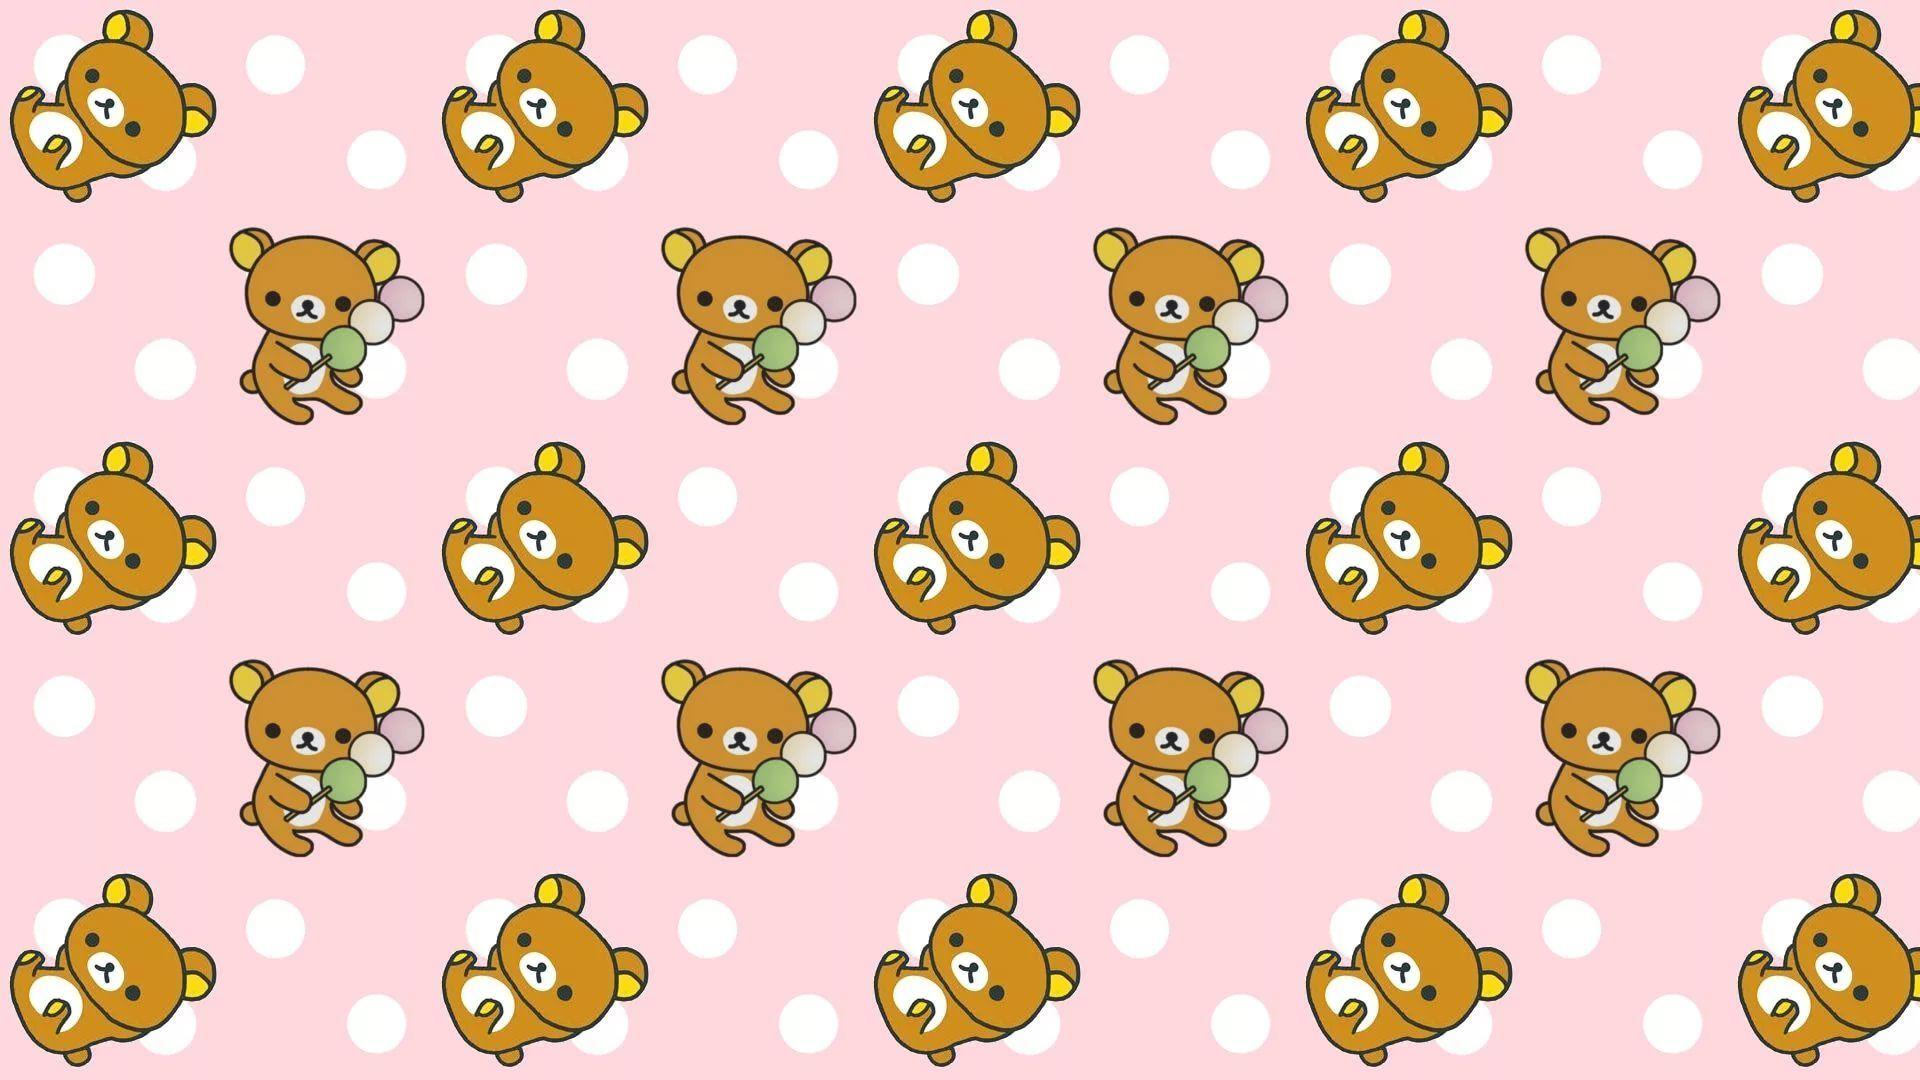 Cute Emoji full wallpaper